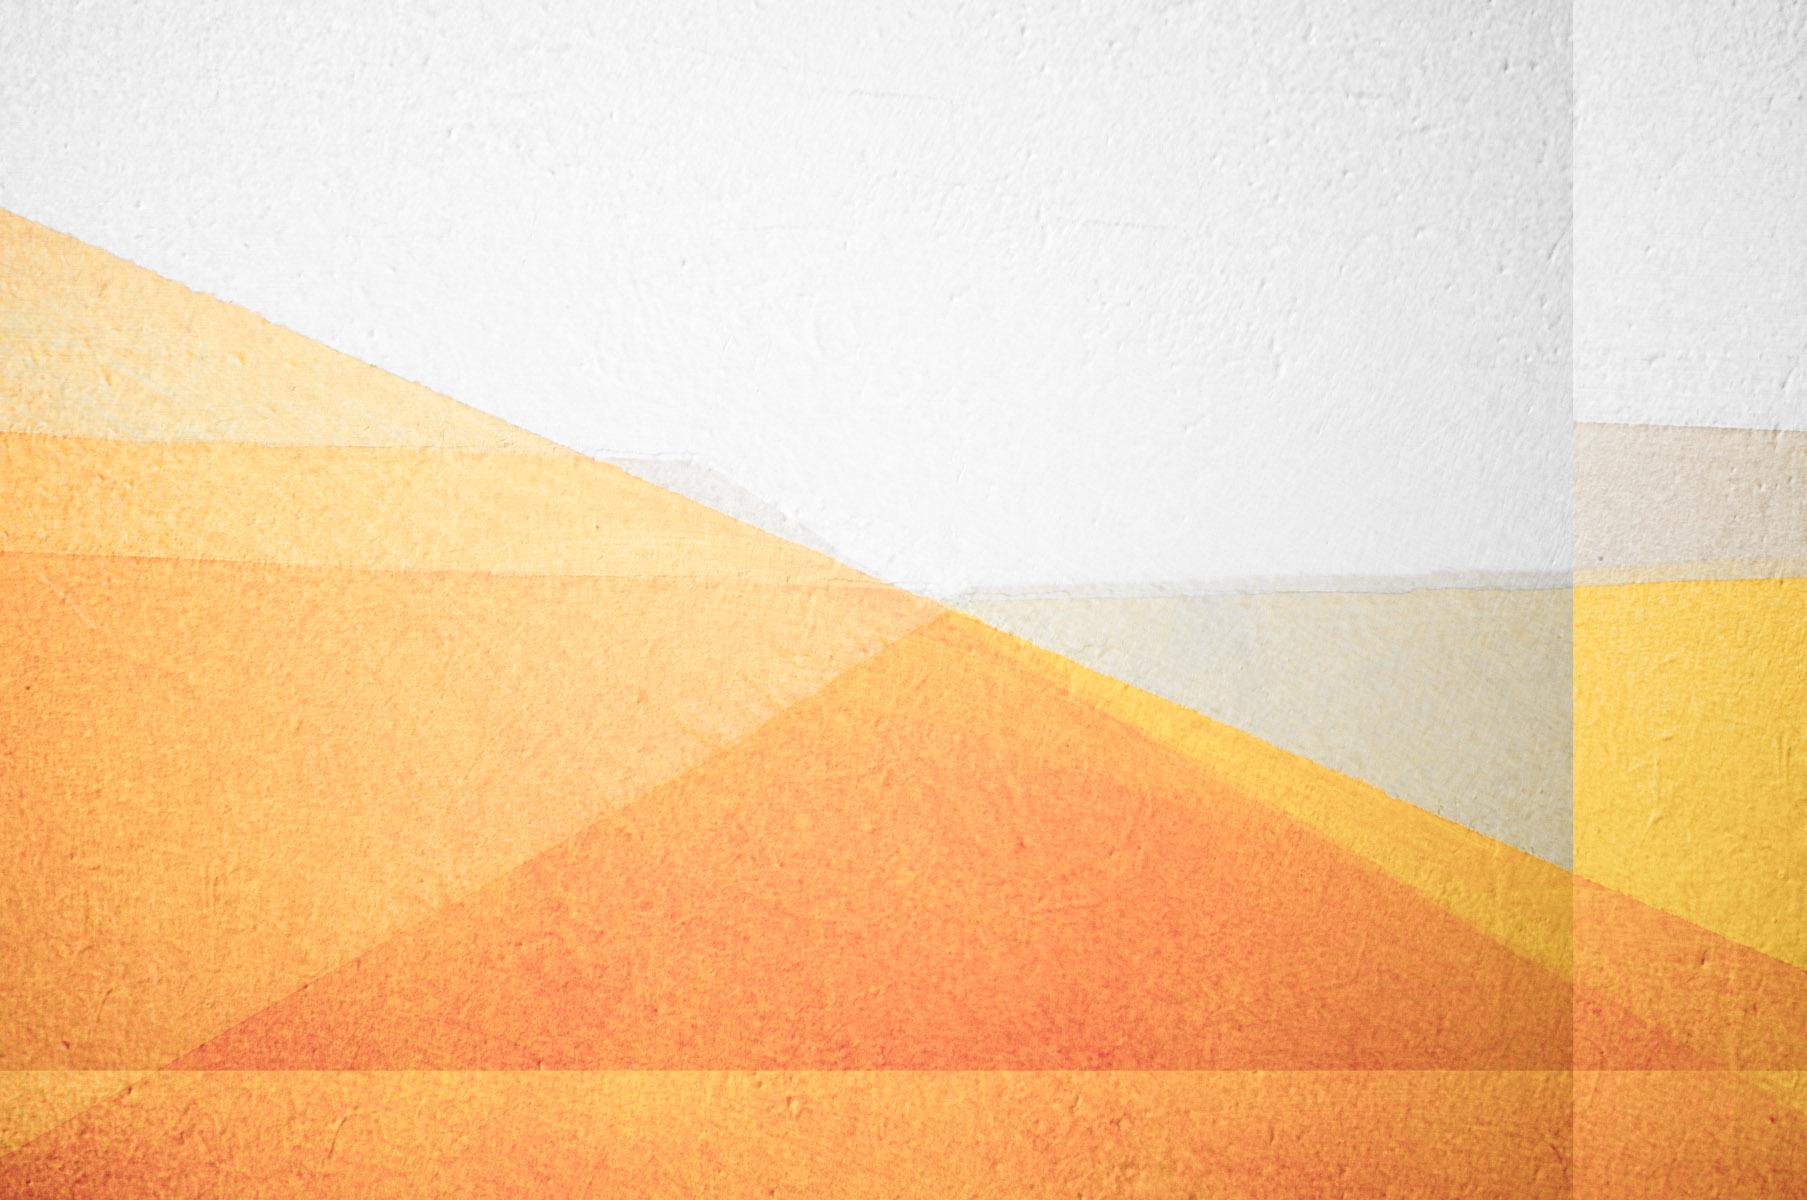 Wallpaper : abstract, wall, yellow, orange, texture, circle, paper ...